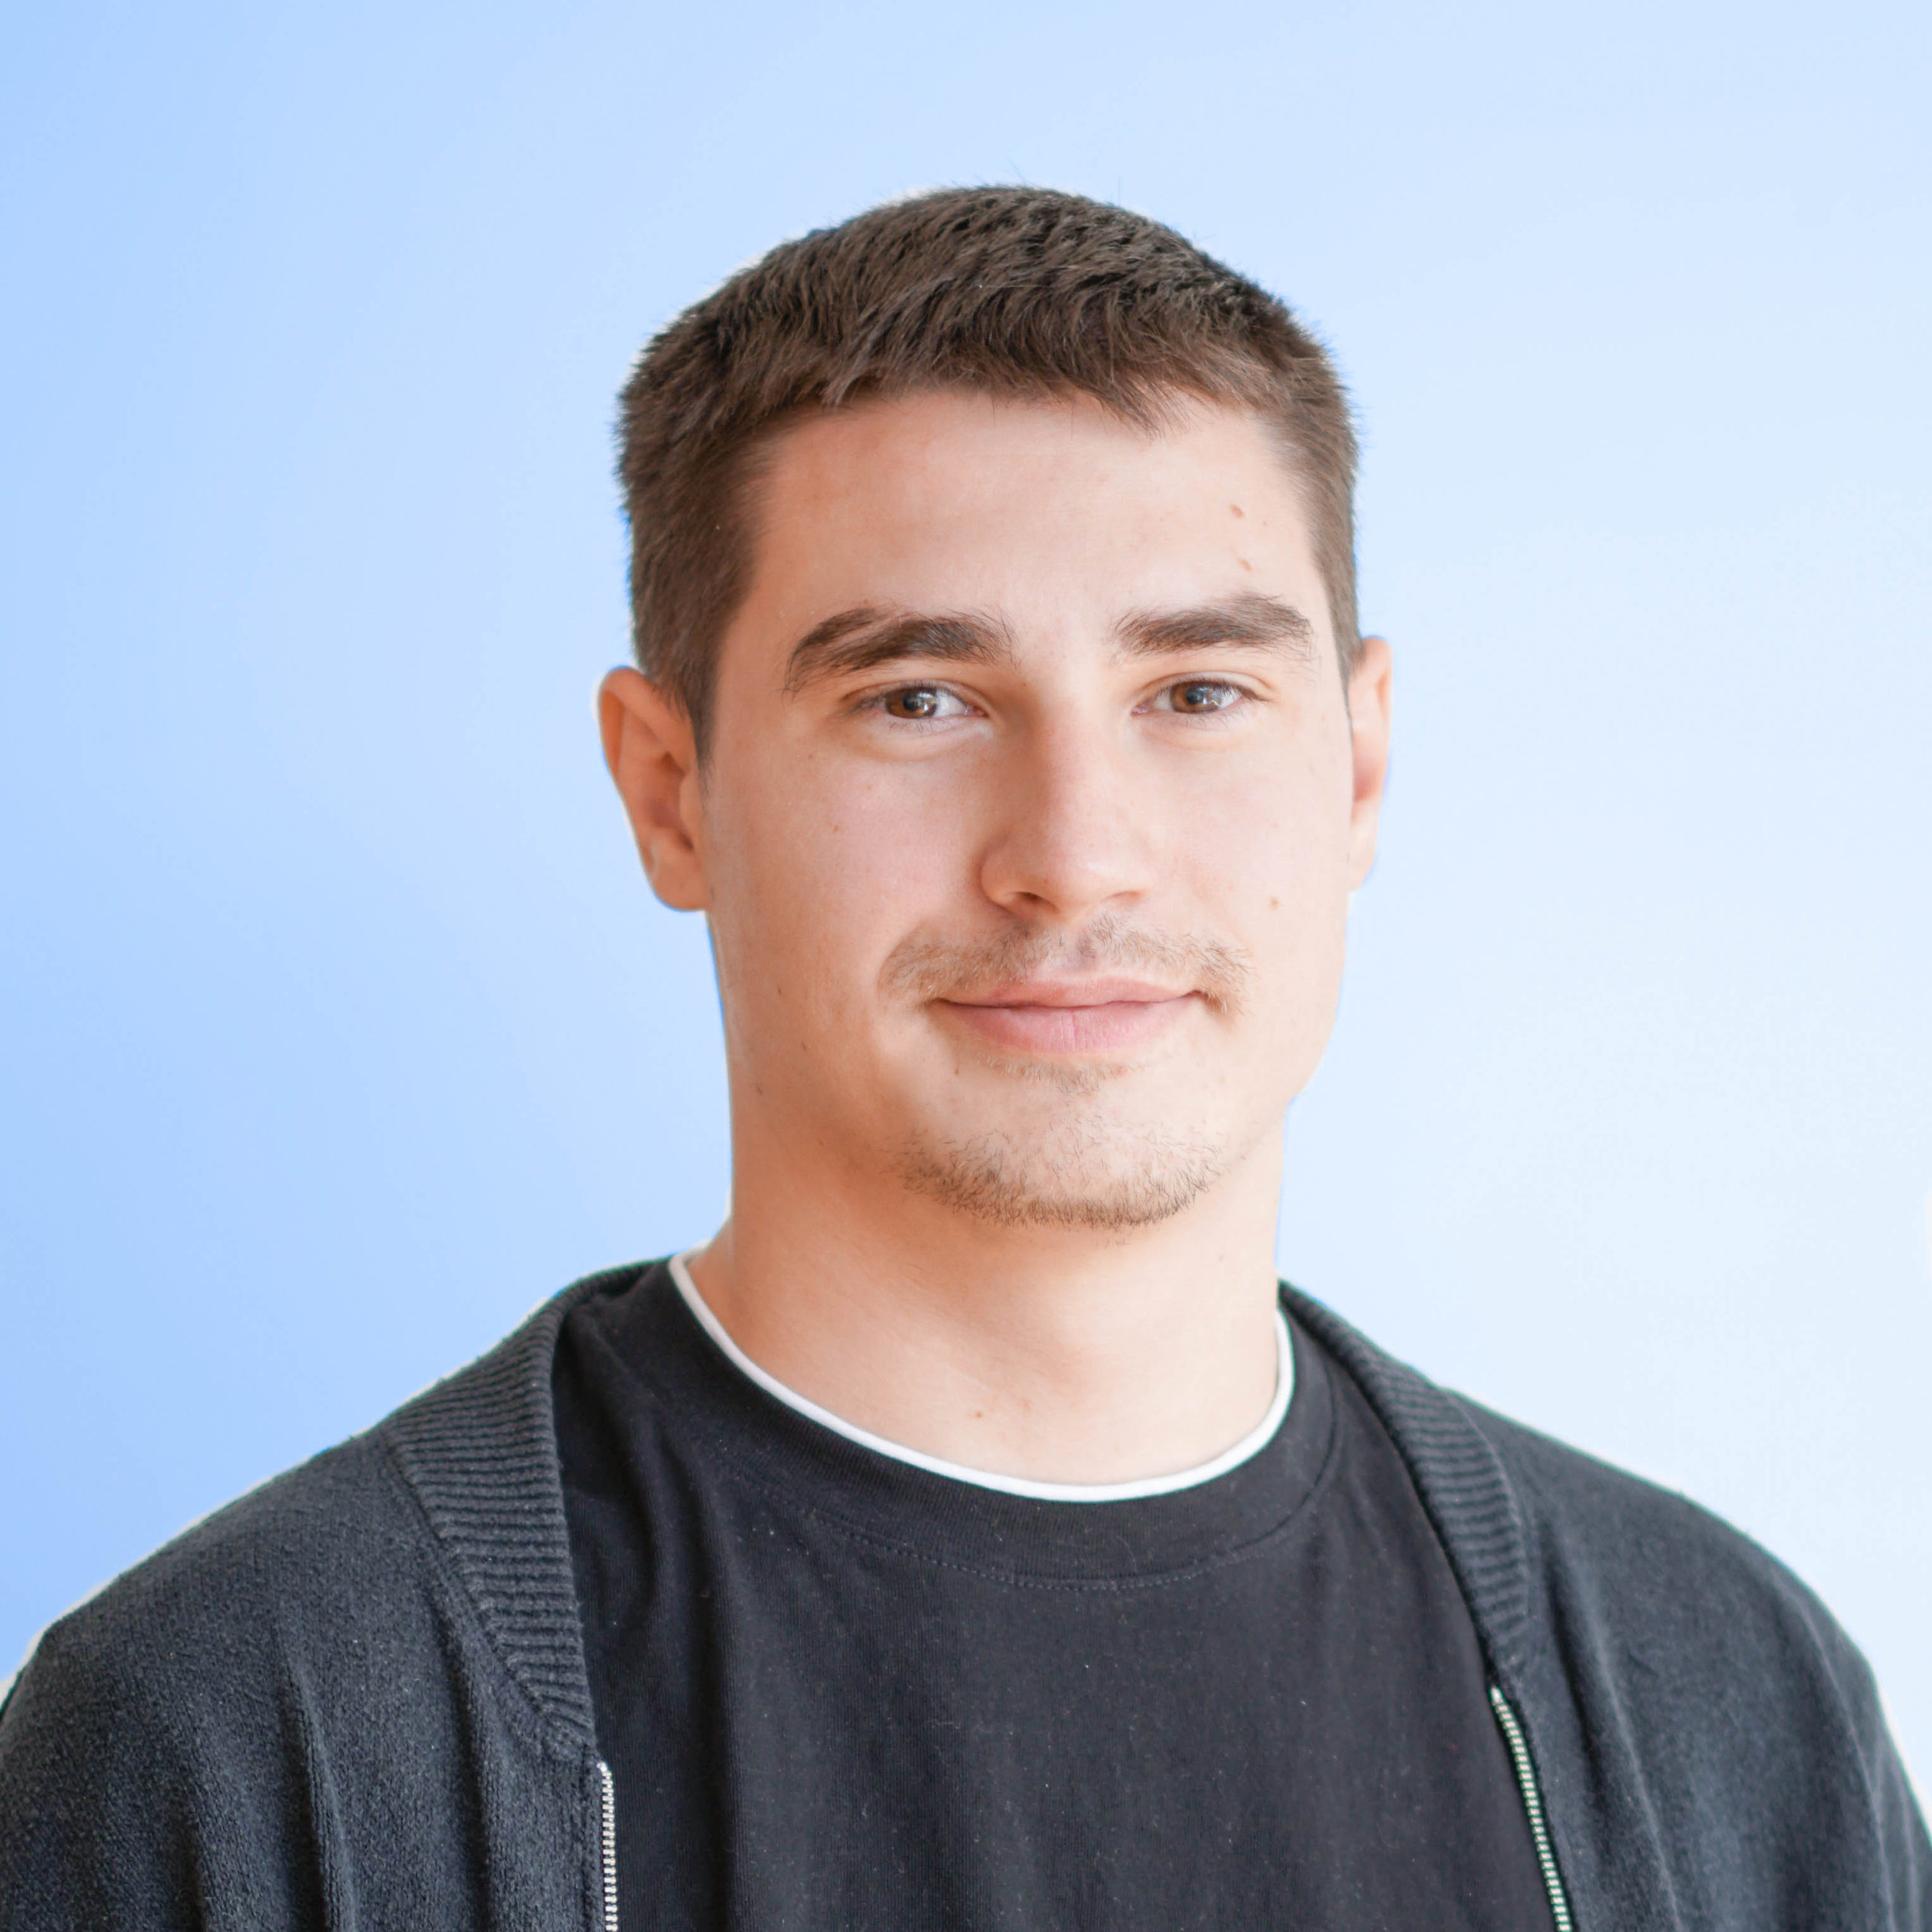 Крученко Александр Андреевич